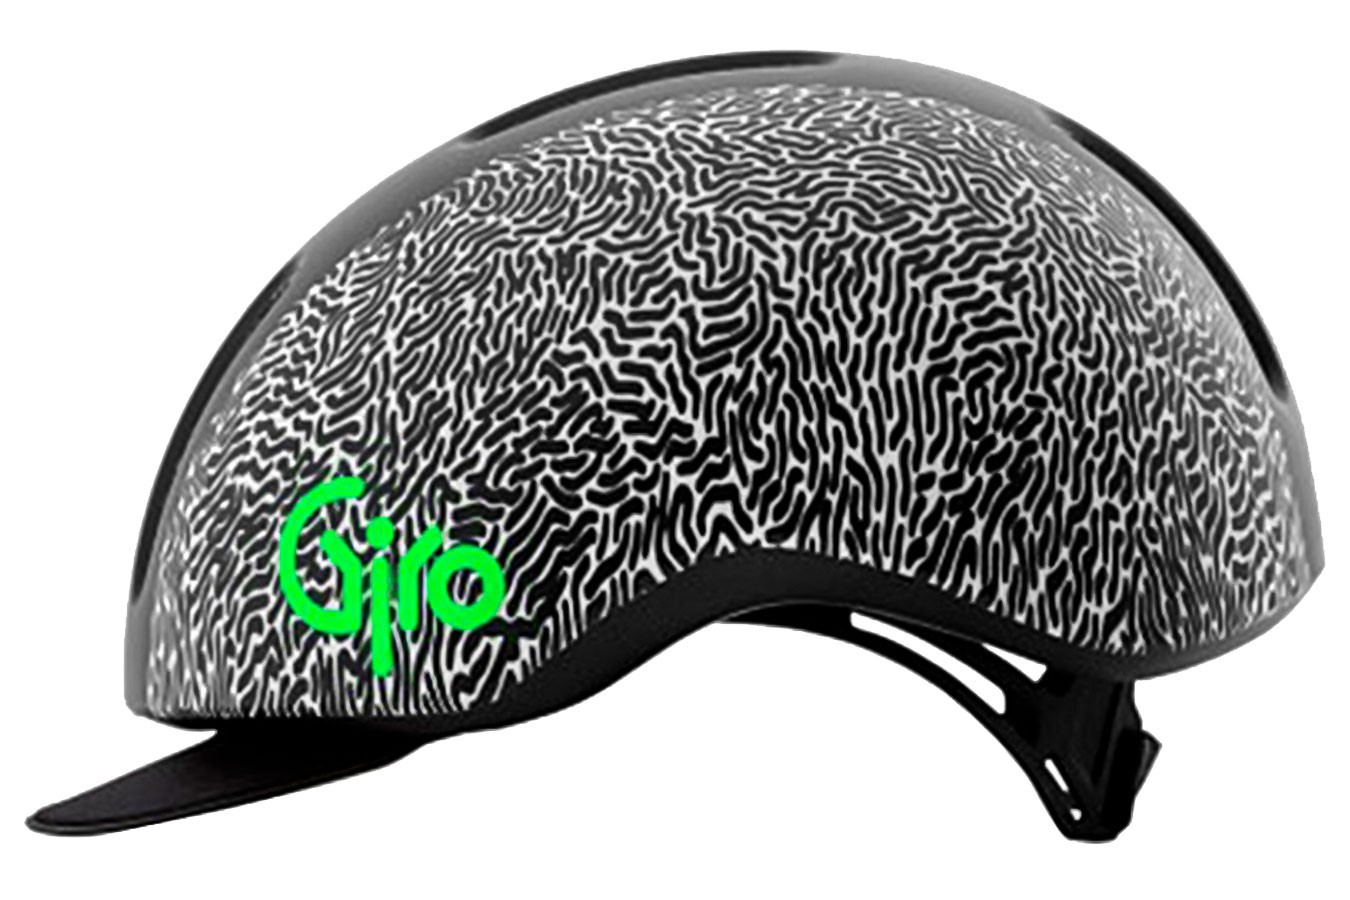 Capacete Ciclista Reverb - Giro